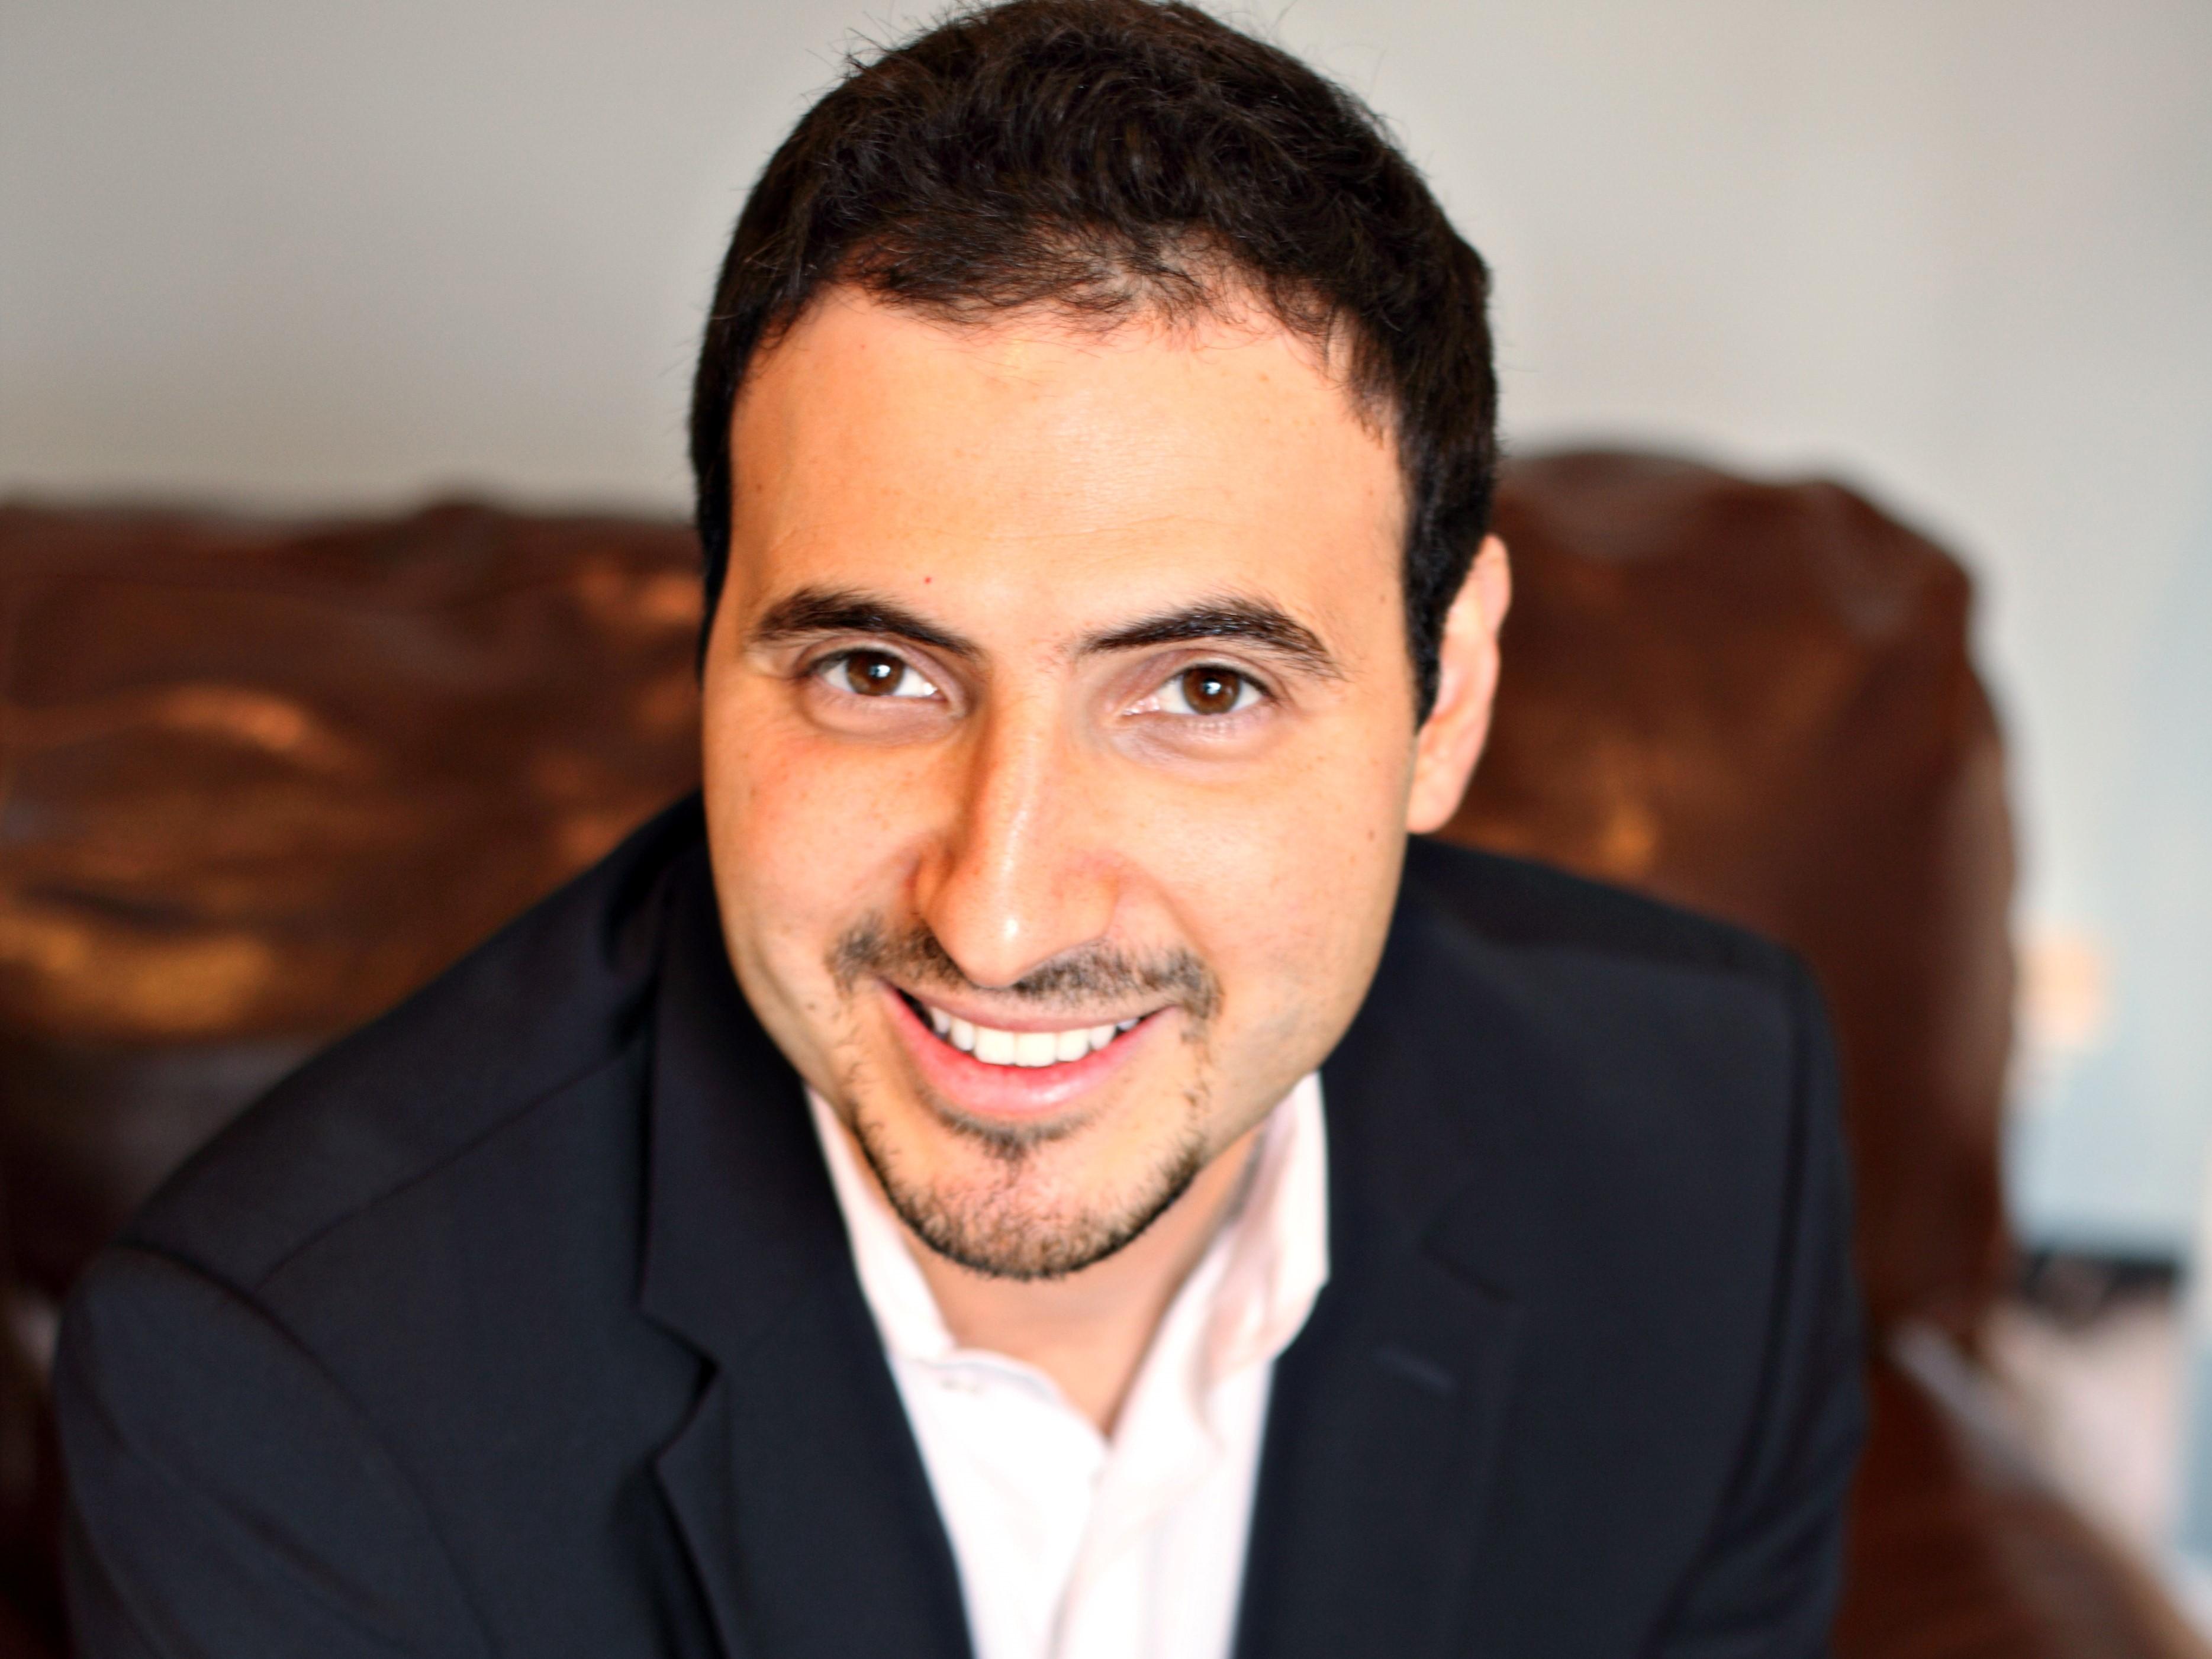 Michael Pelardis